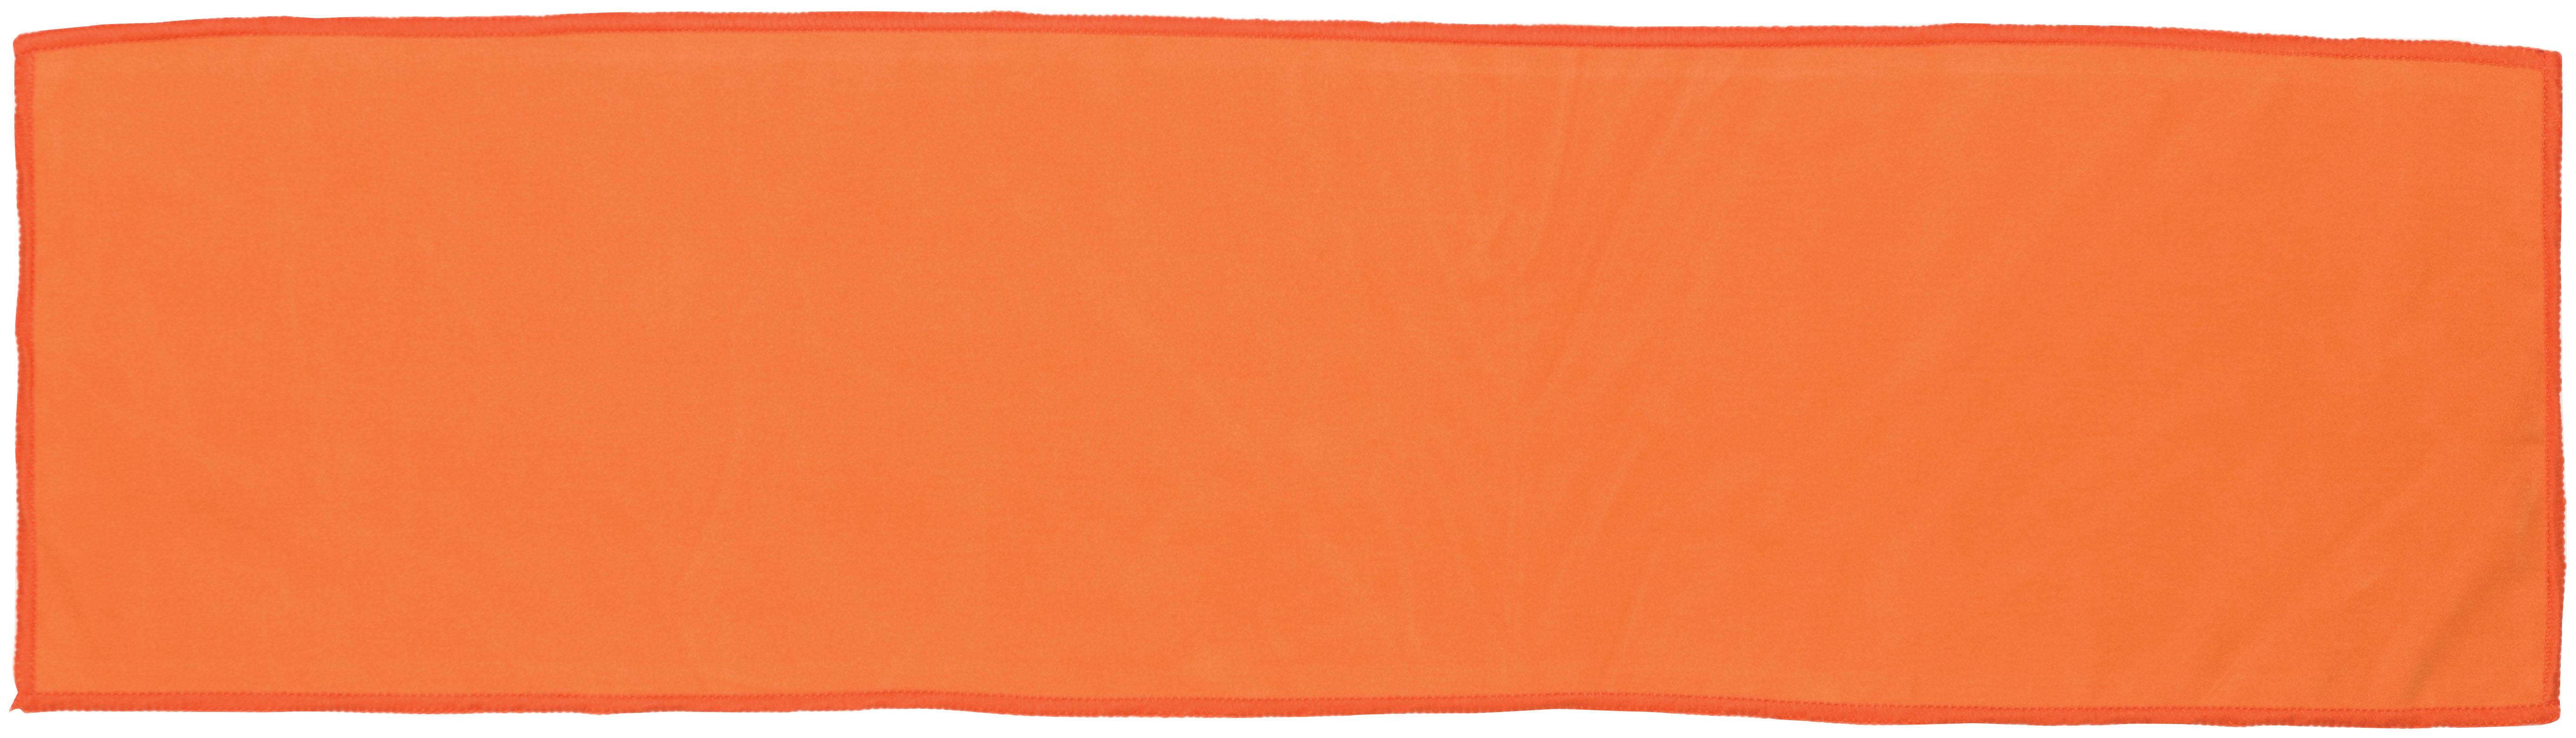 Frigitowel-Orange-Small-Flat